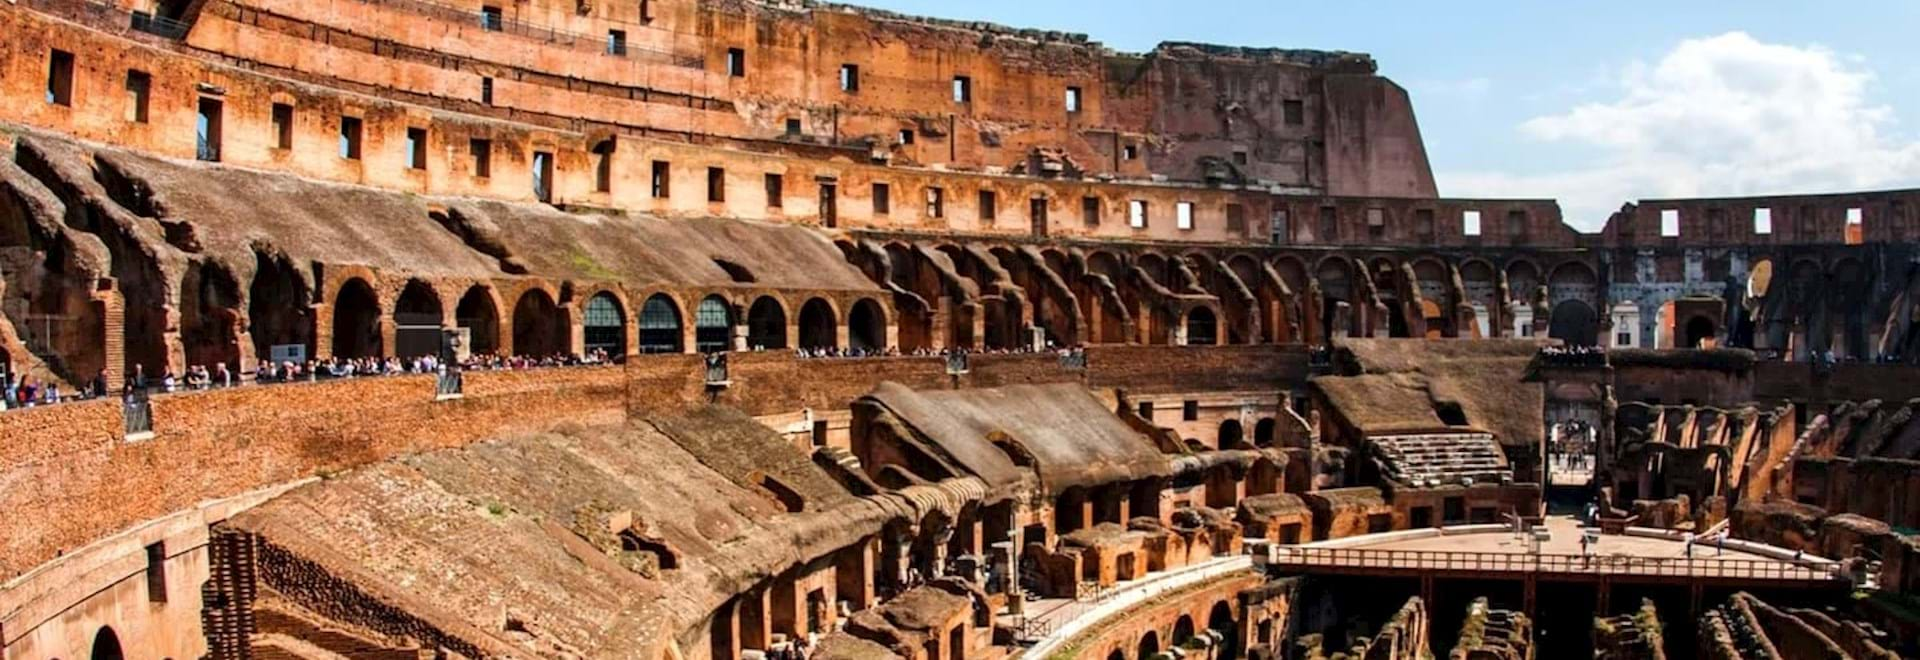 Colosseum Arena Interior, Rome